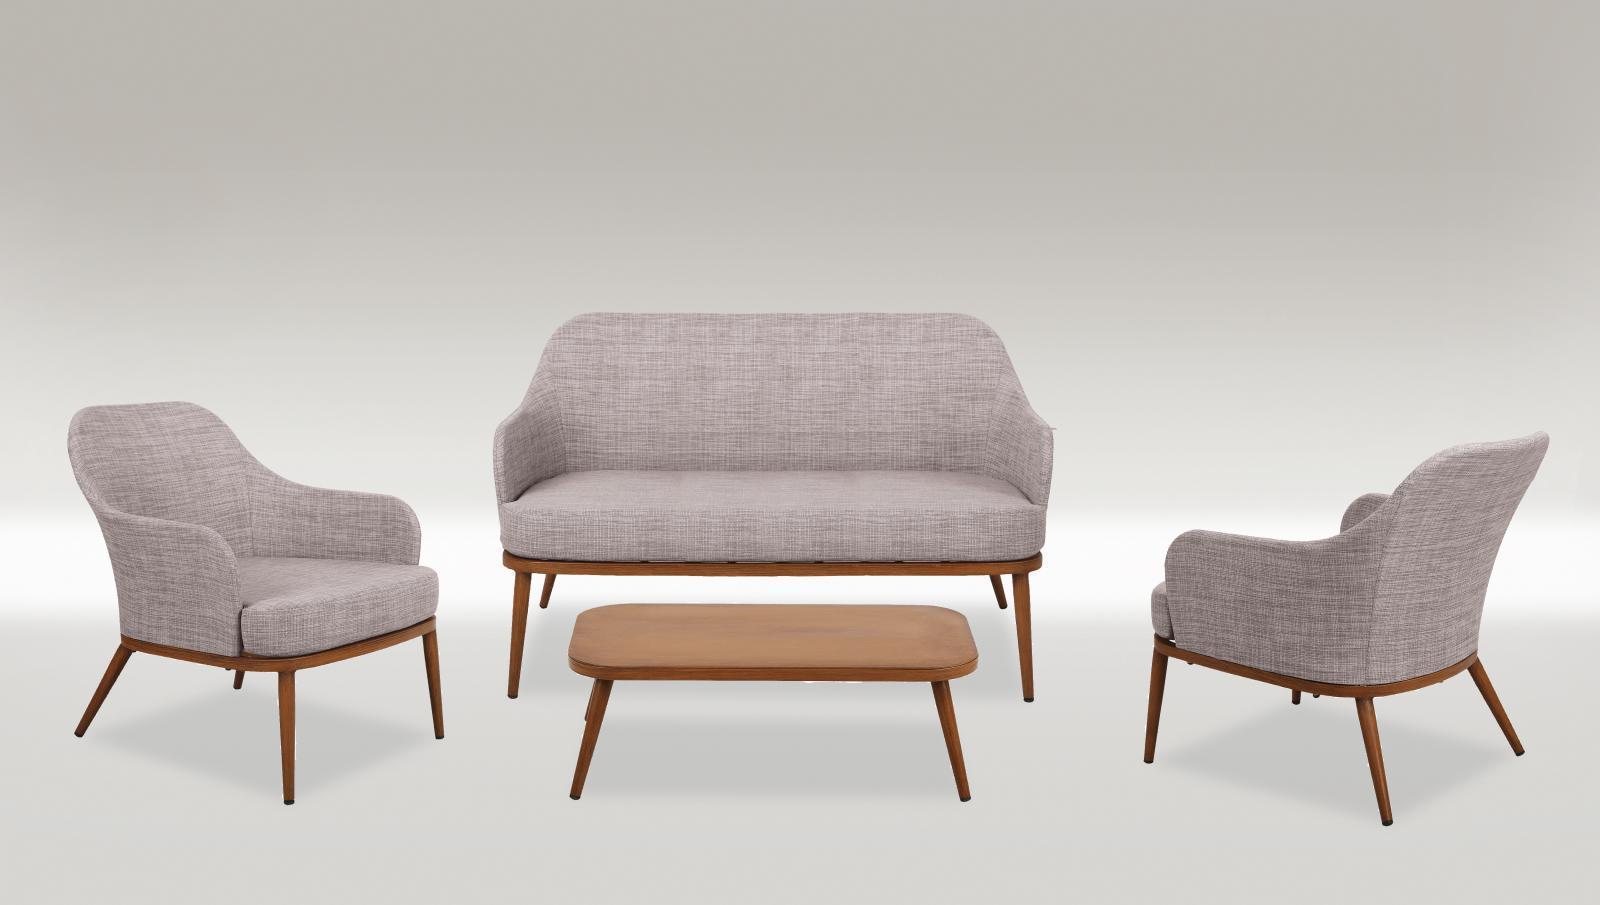 Комплект мягкой мебели Rodi 4